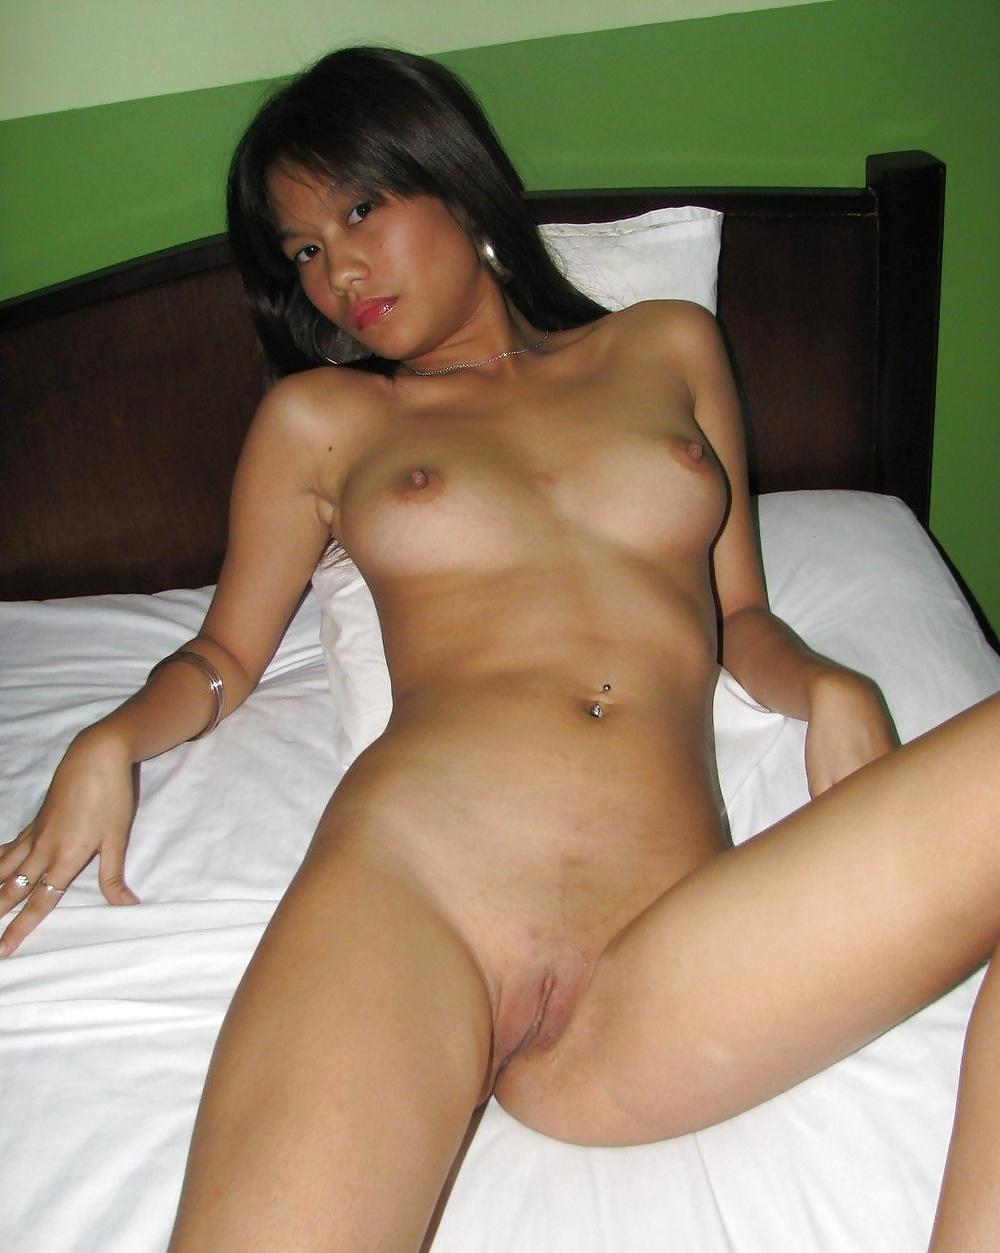 Thai lady bar pattaya nice ass sexy dance 9